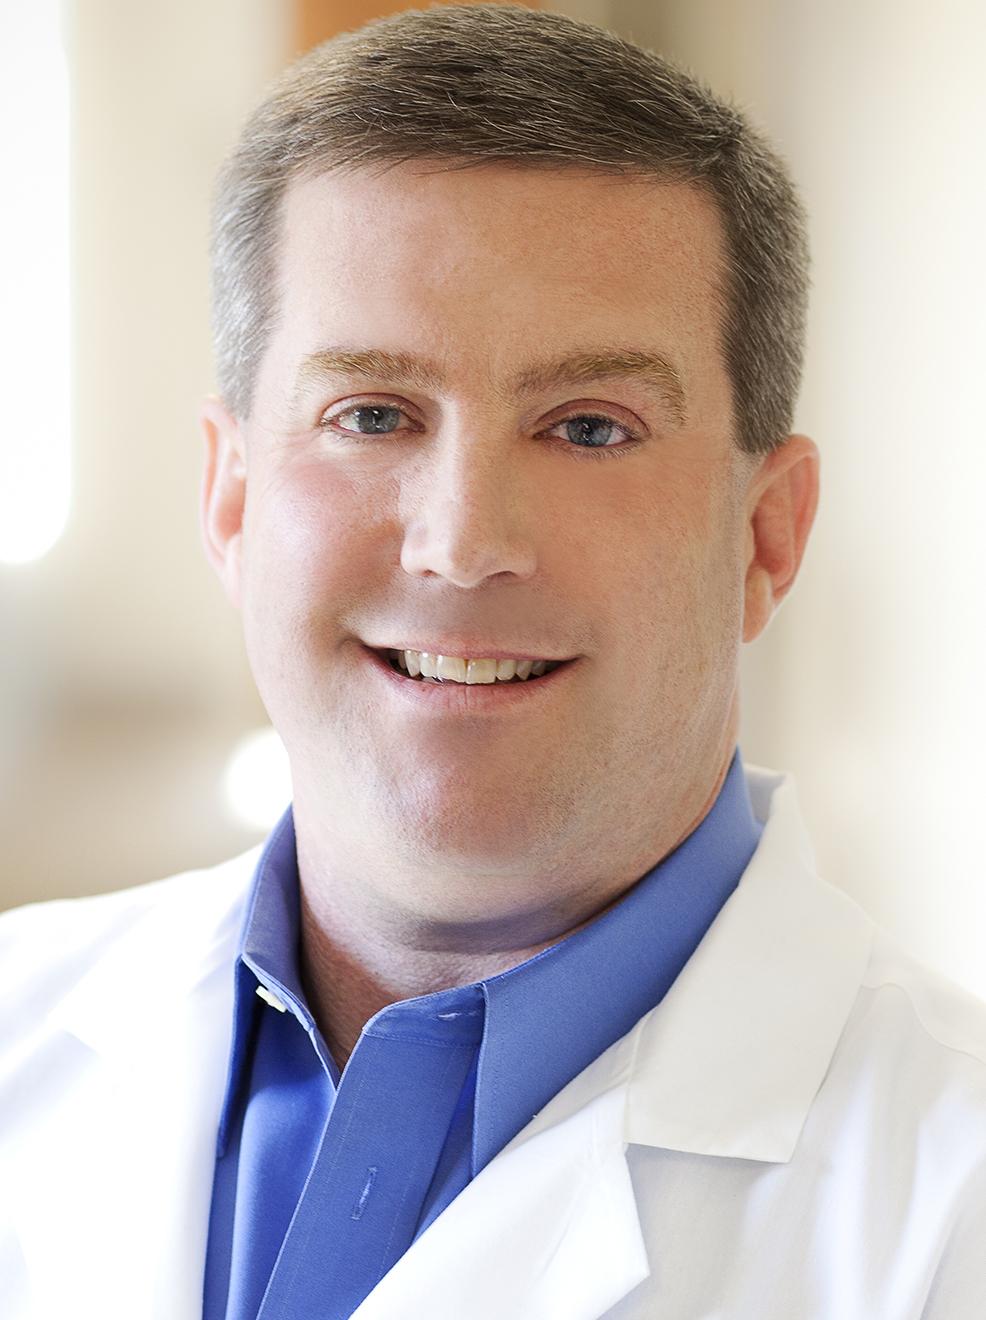 Scott Bowers, MD